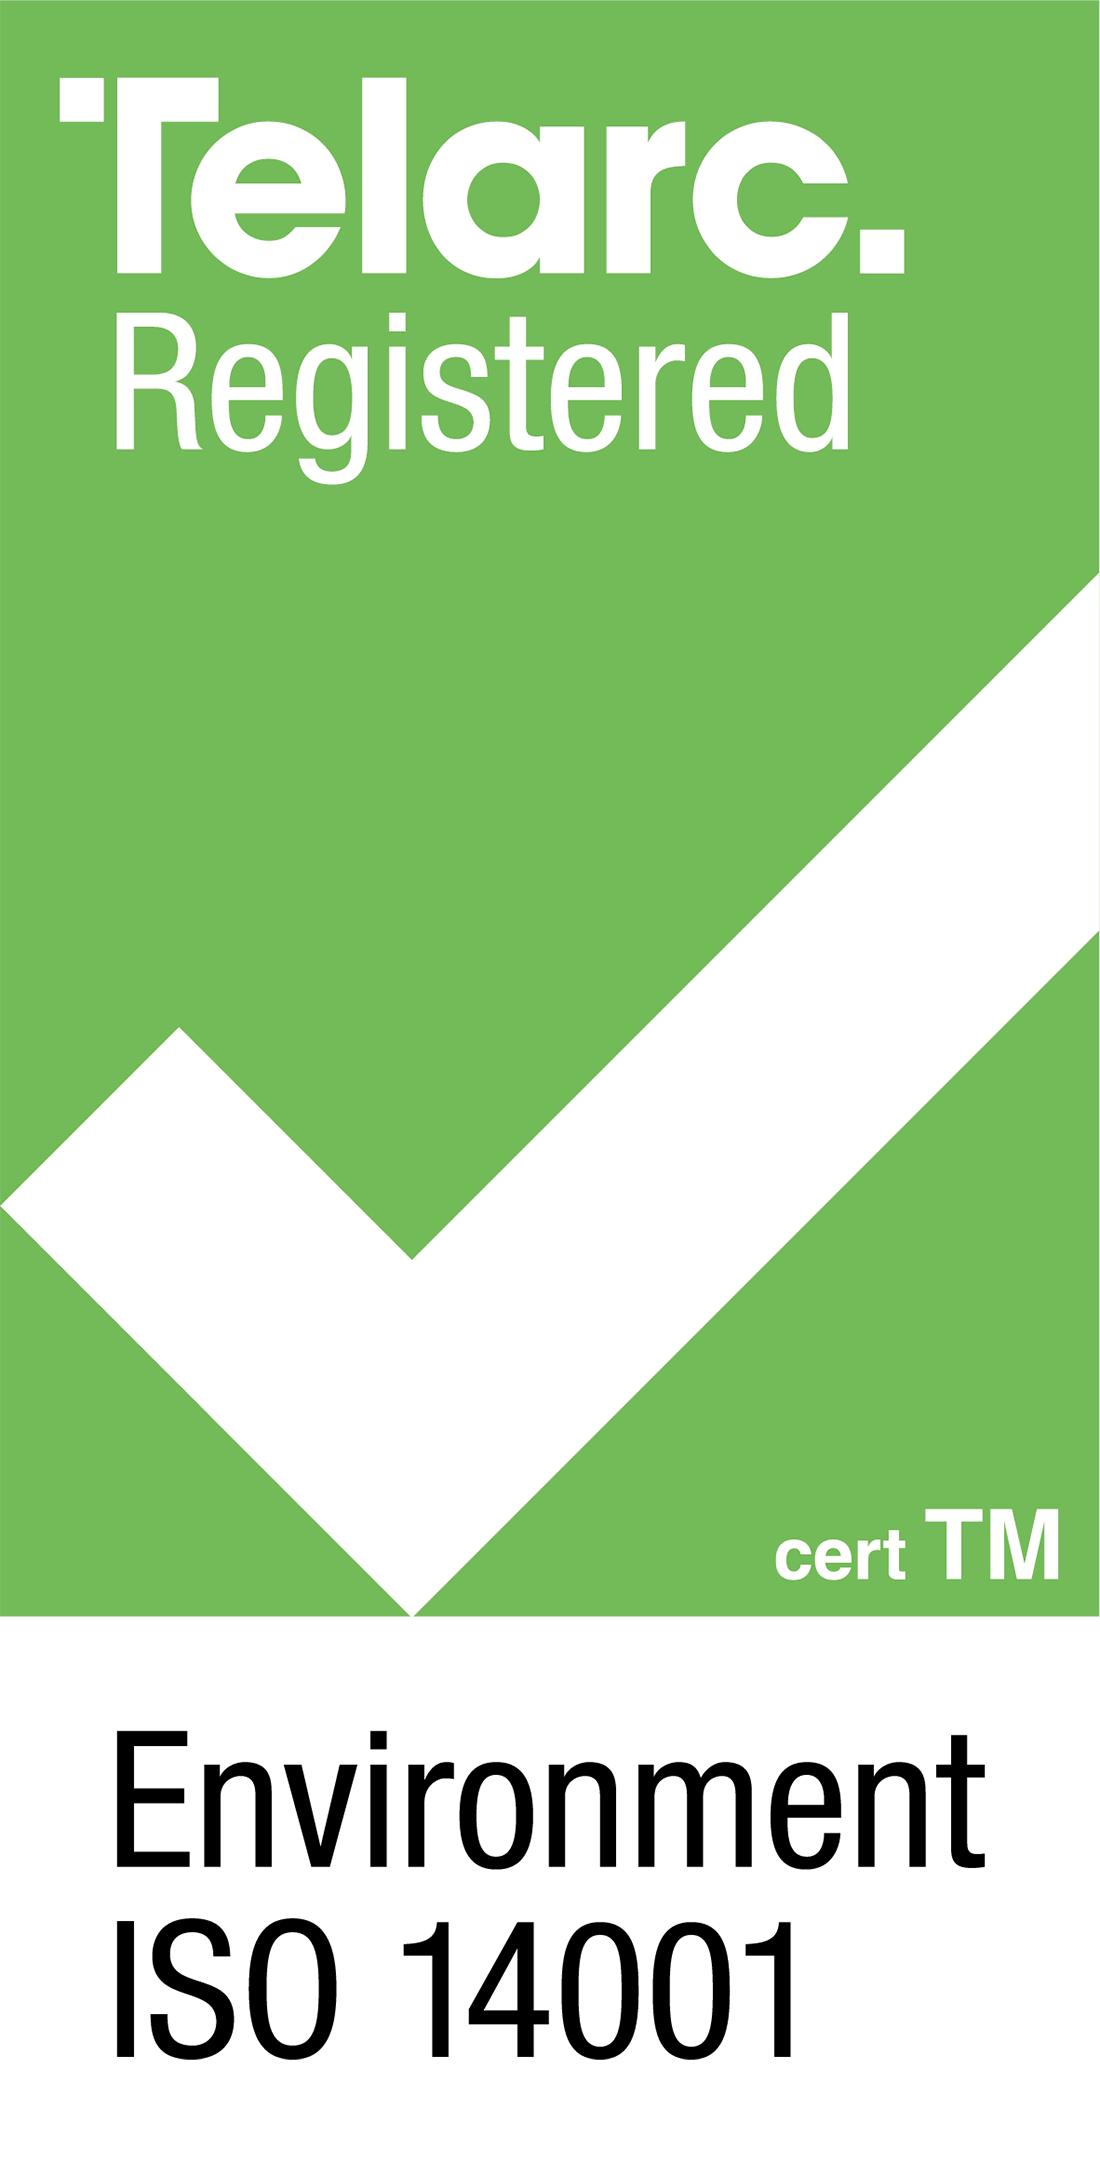 Telarc ISO 14001 logo